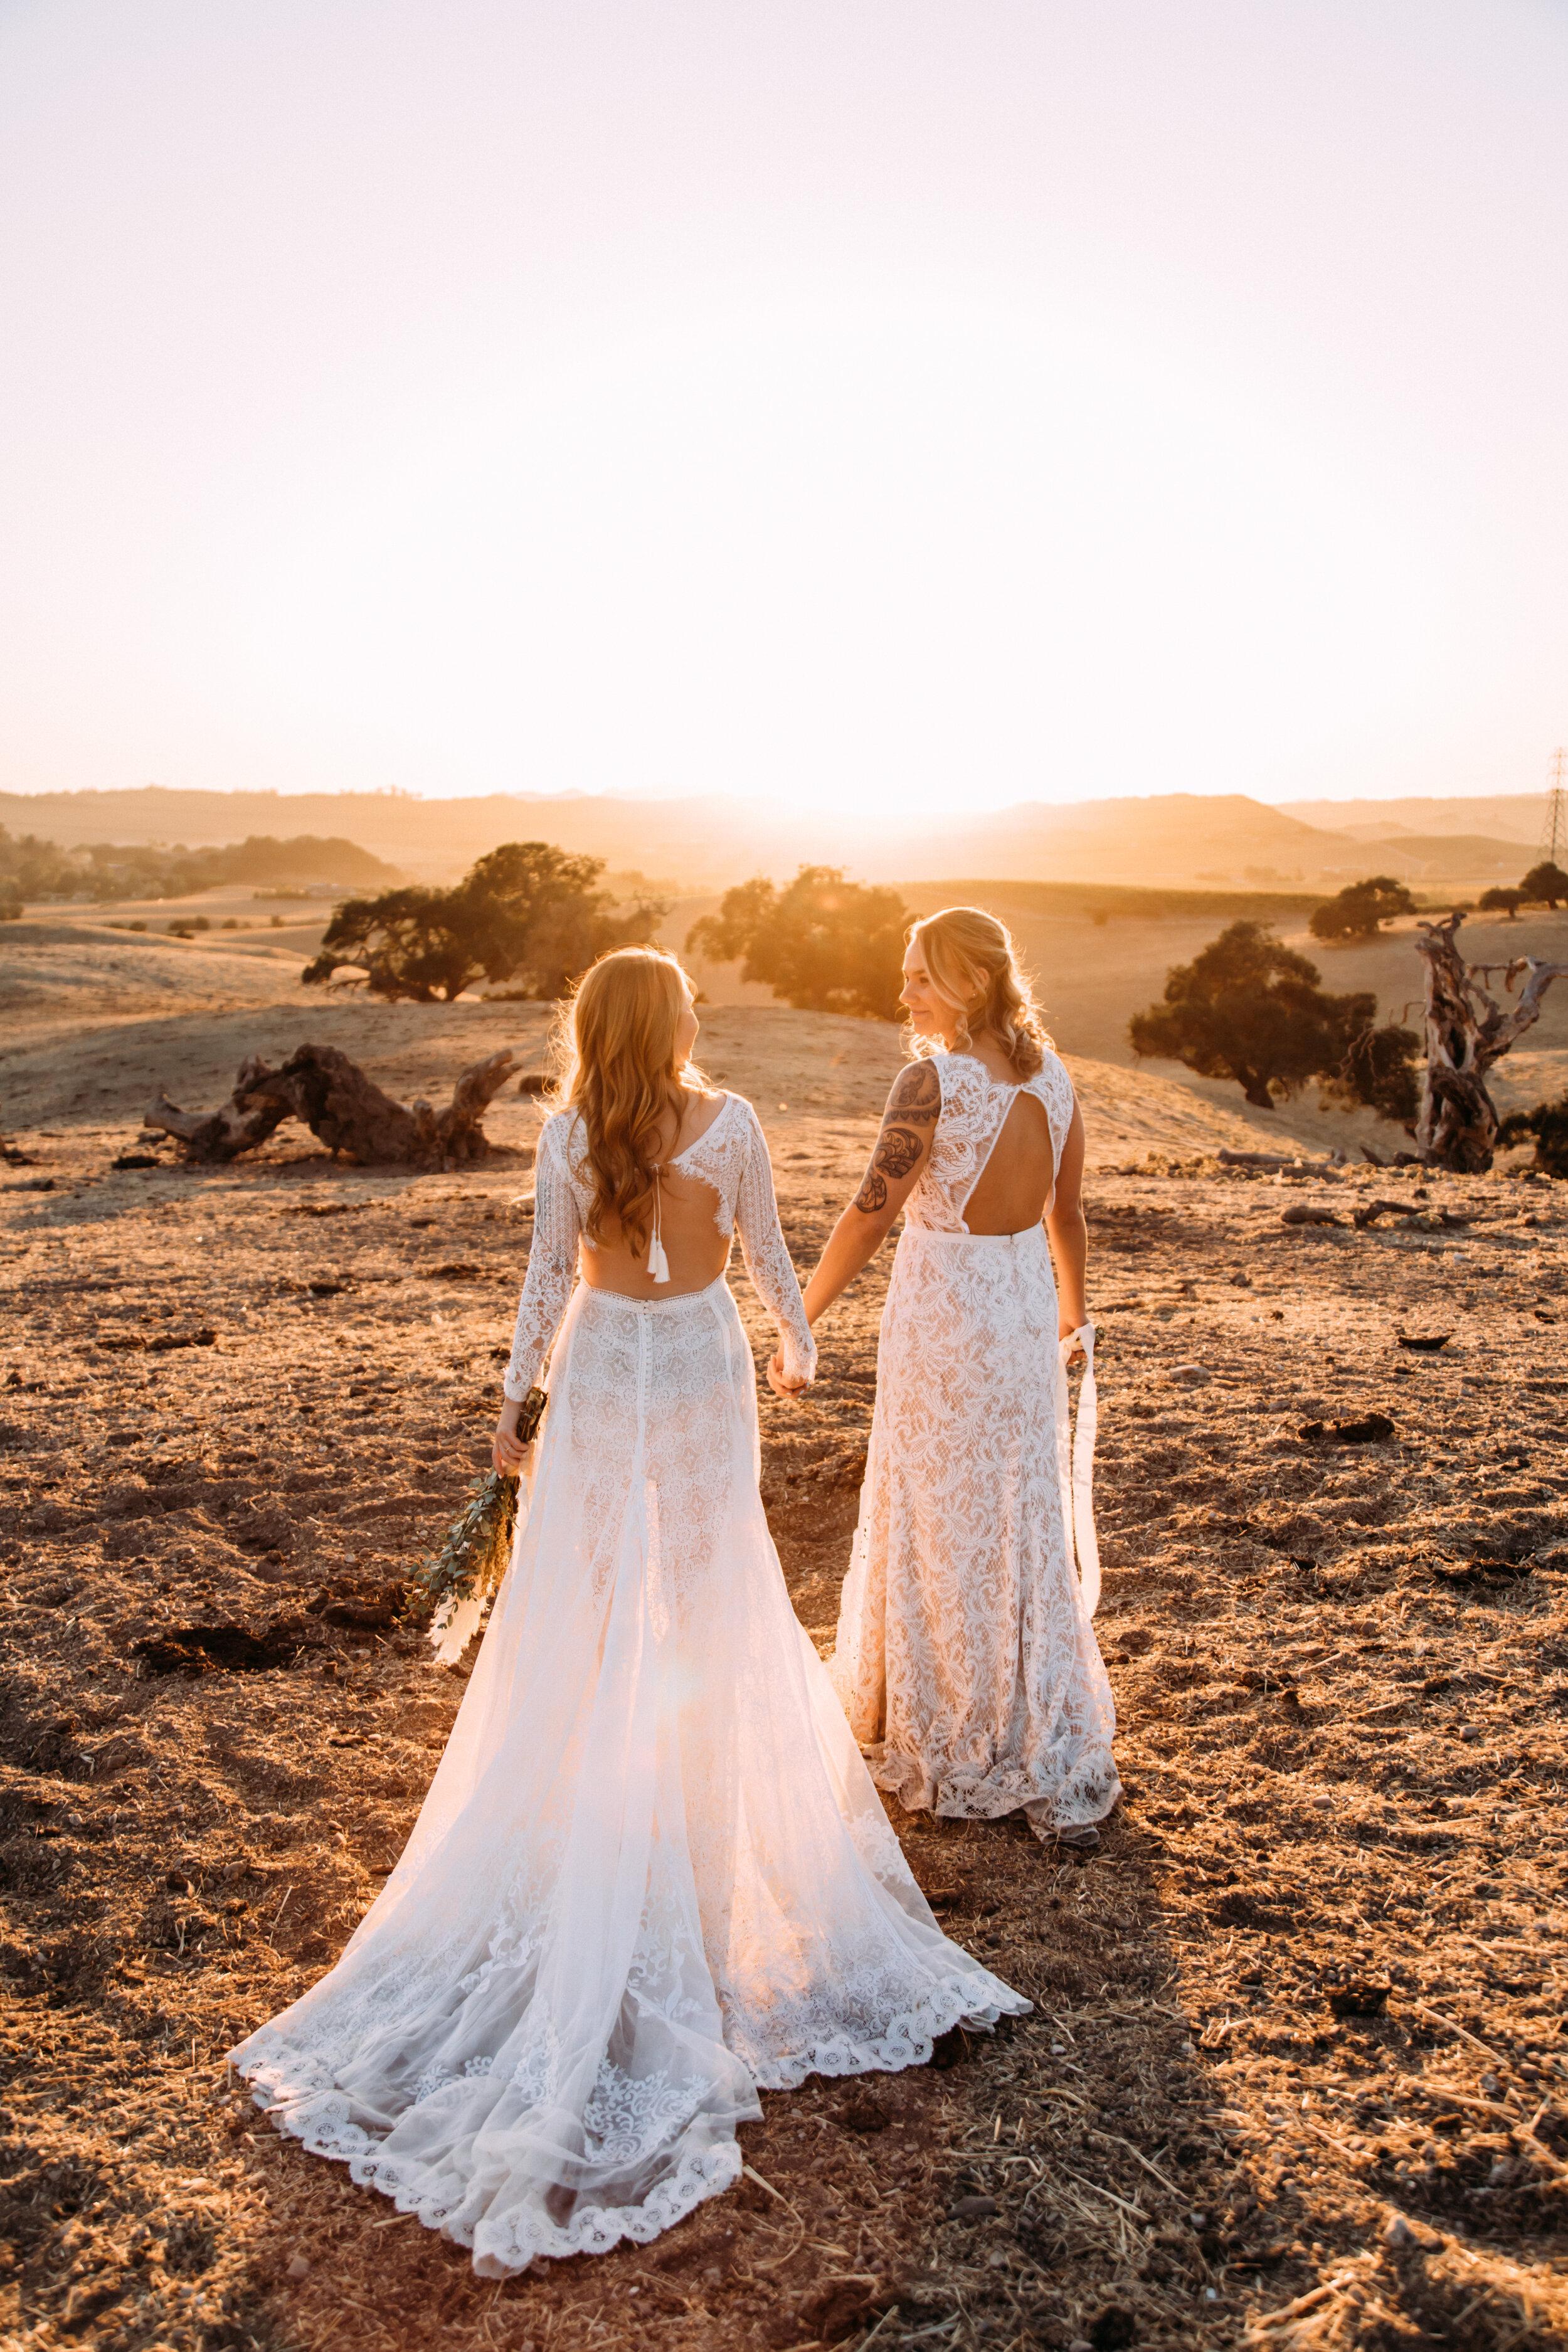 Brenna Taylor Spreafico Farms Wedding San Luis Obispo Photographer Ashlyn Savannah Creative,New York City Hall Wedding Dresses